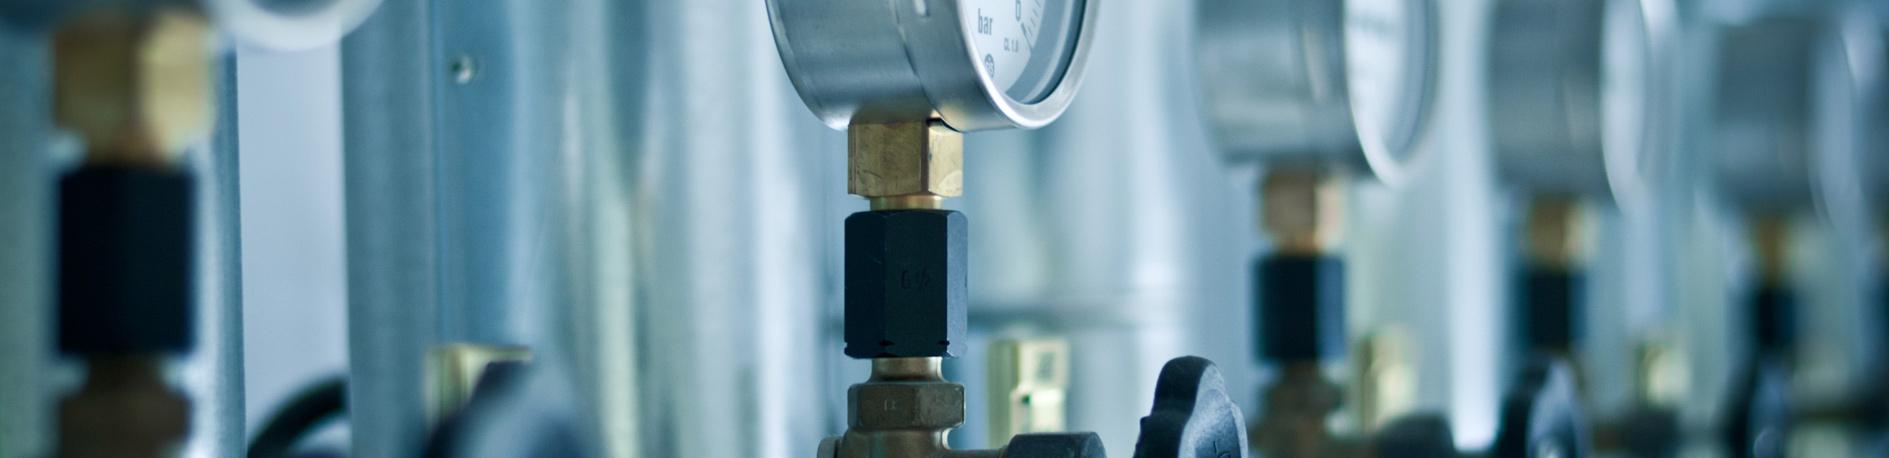 close up of medical gas valves